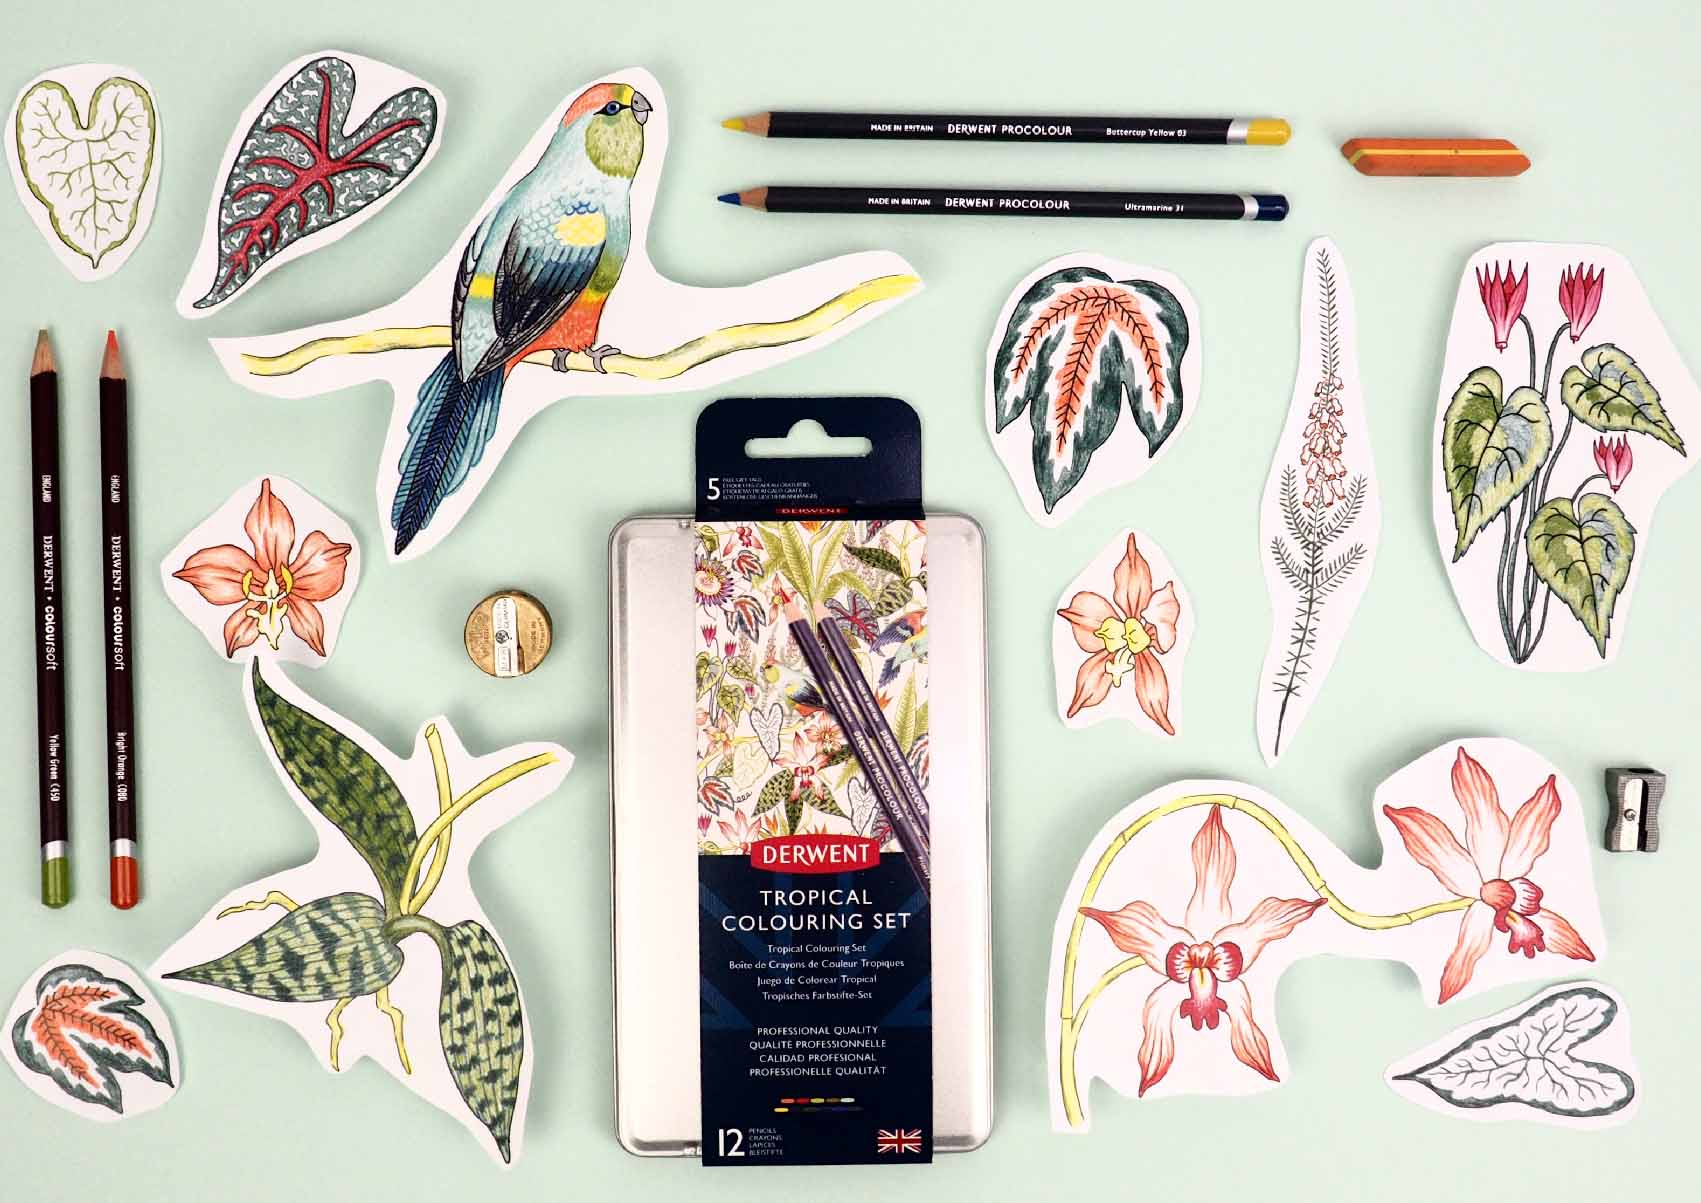 Derwent-Tropical-Pencil-set-Illustration-Pattern-Jacqueline-Colley-4.jpg